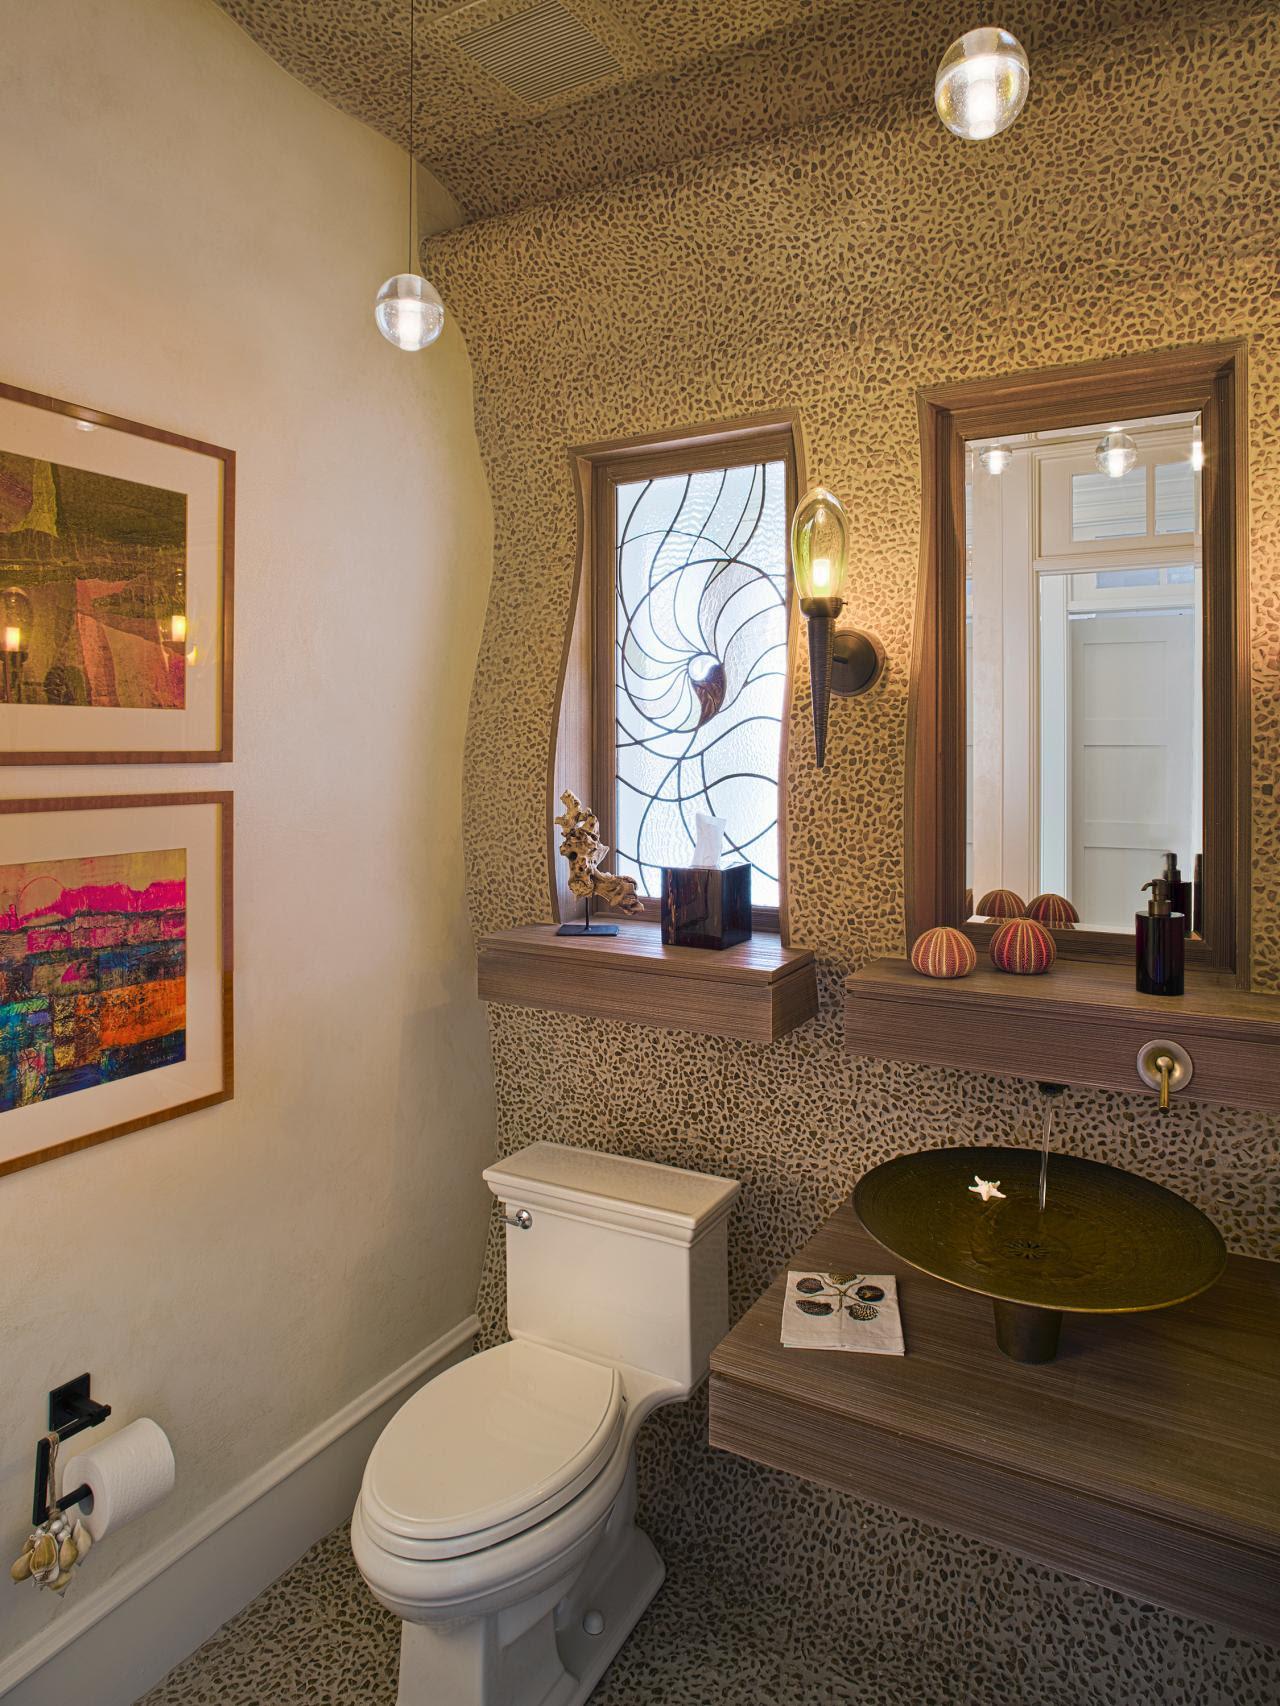 Beach & Nautical Themed Bathrooms: HGTV Pictures & Ideas ...